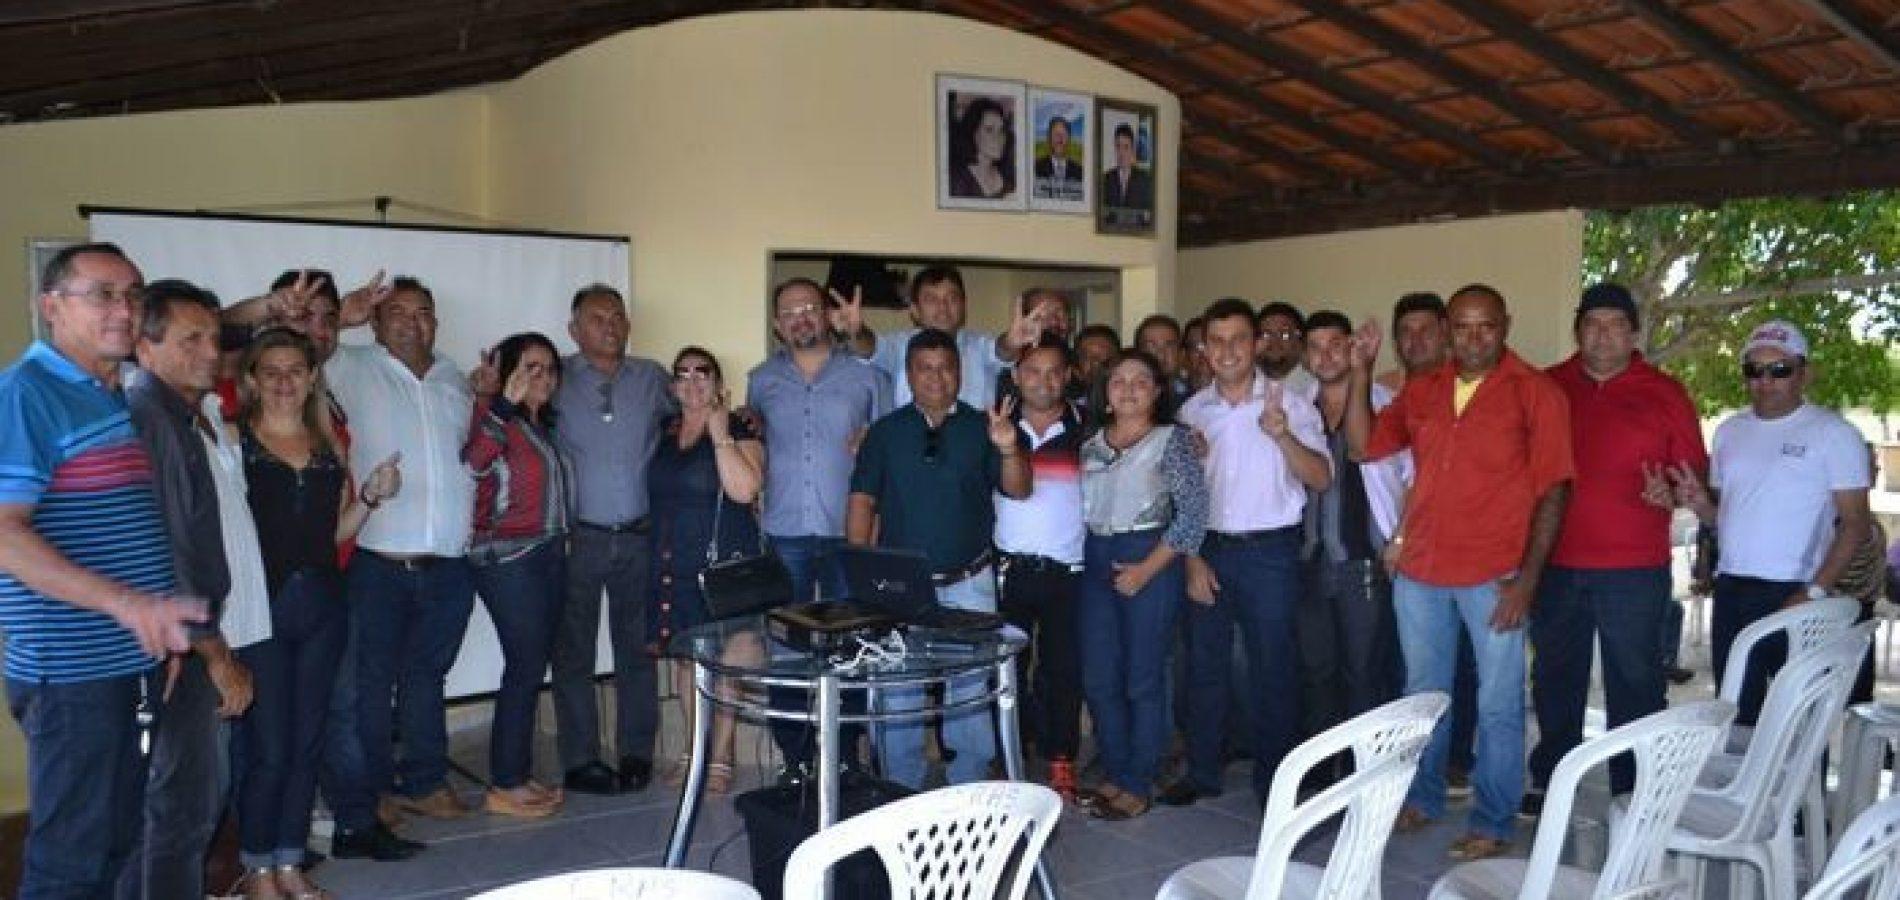 ALEGRETE DO PIAUÍ | Prefeito Márcio Alencar e pré-candidatos a vereador participam de oficina eleitoral